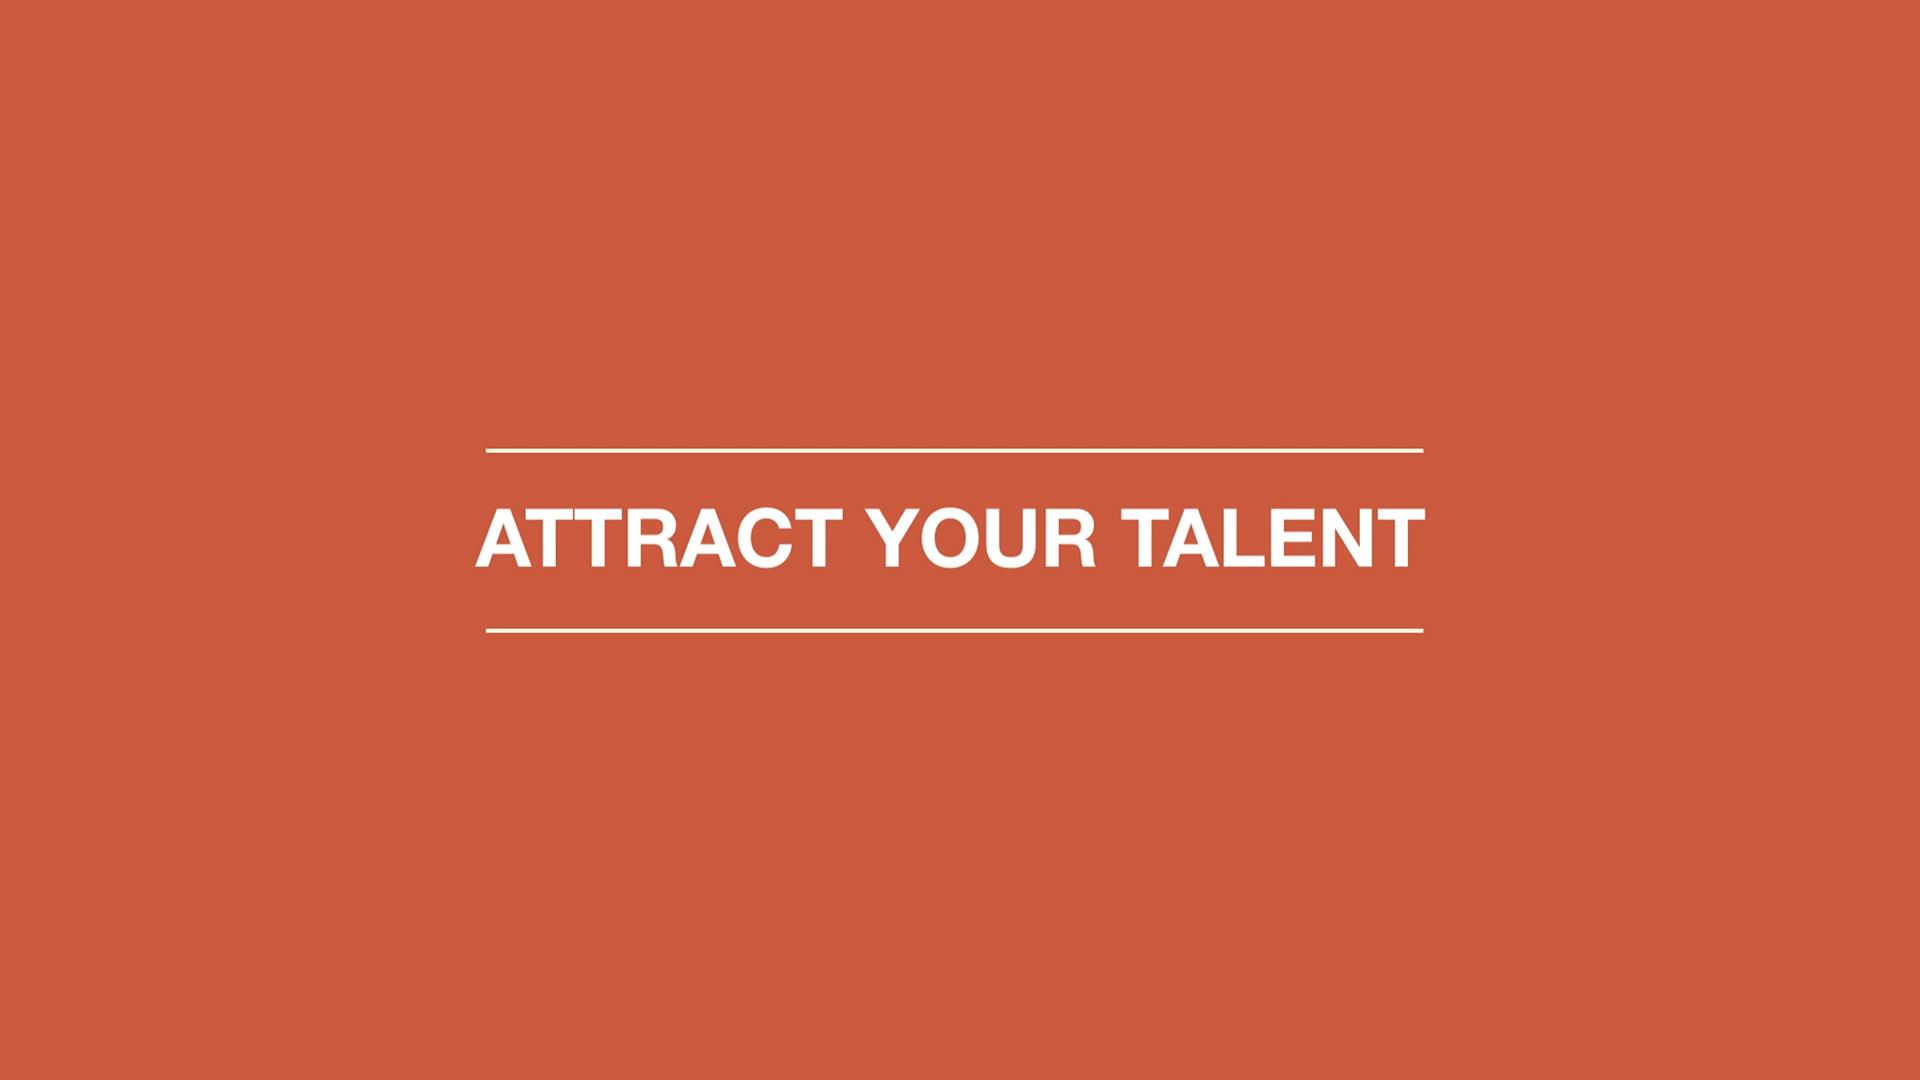 A Global Digital Recruiting Technology Company